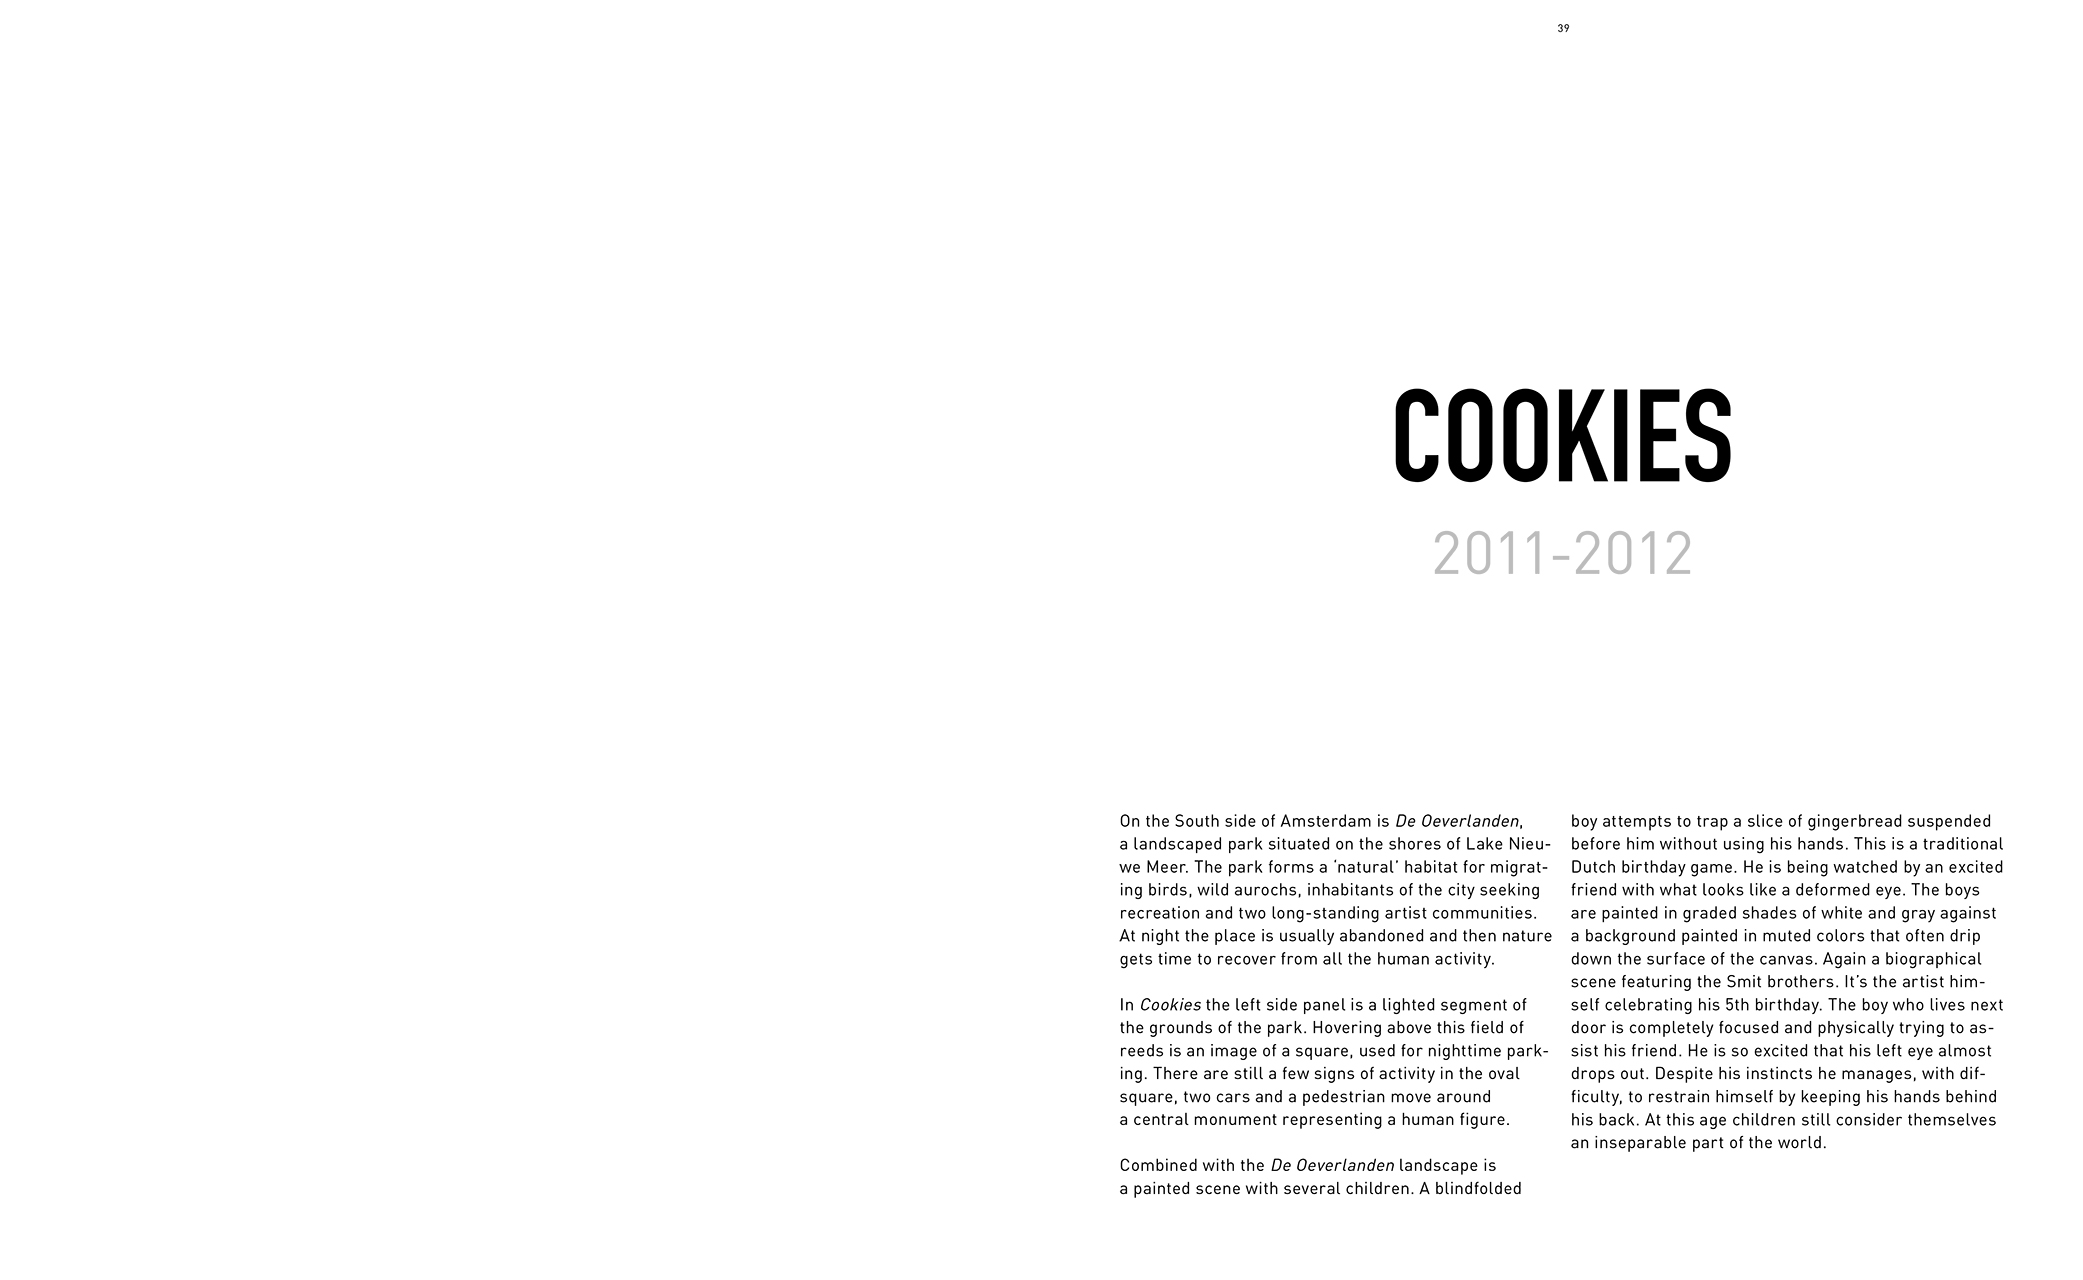 Robert_Smit_GRID_3_ Cookies_title_page